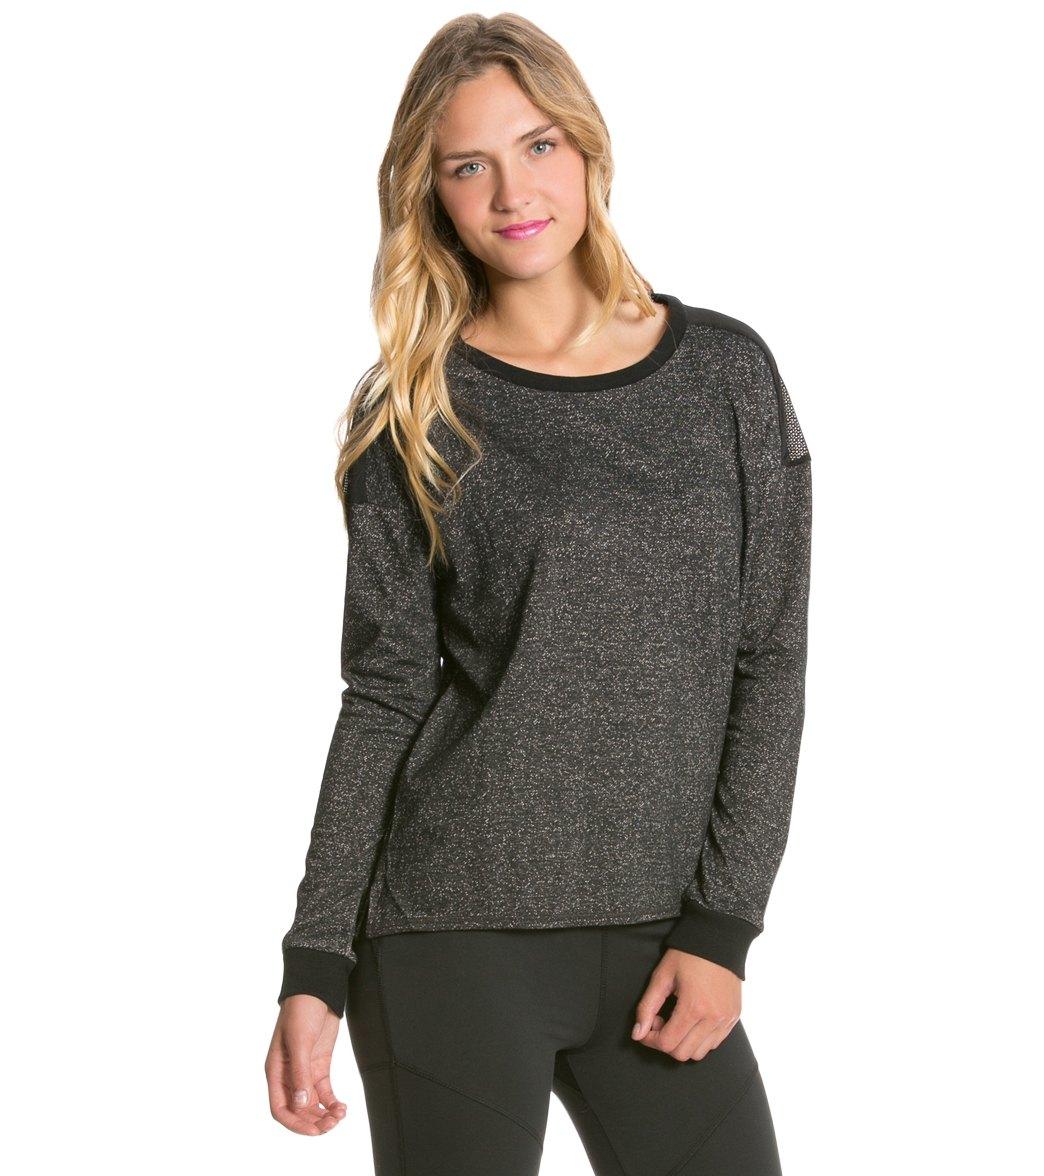 Hurley Dri Fit L S Fleece Crew Sweater at SwimOutlet.com - Free Shipping ca02c2859